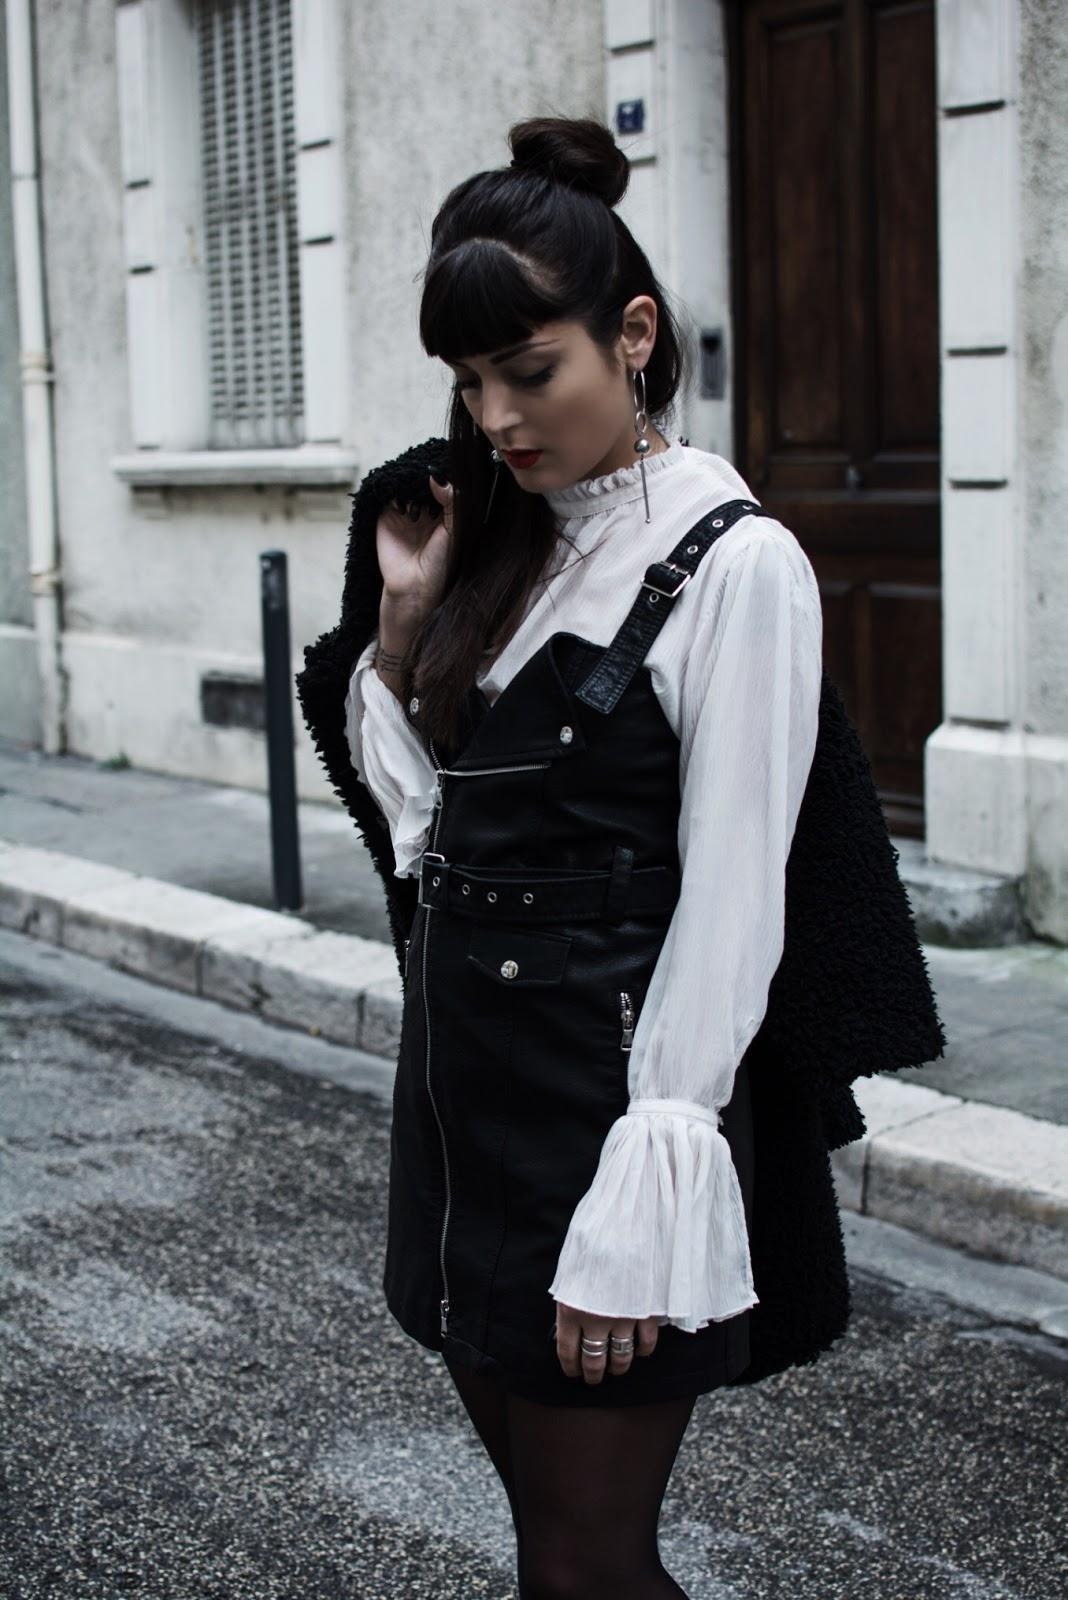 blogger france, mode, fille rock, style rock, style vintage, style retro, style glamour, bons plans shopping, blogueuse mode, style grunge